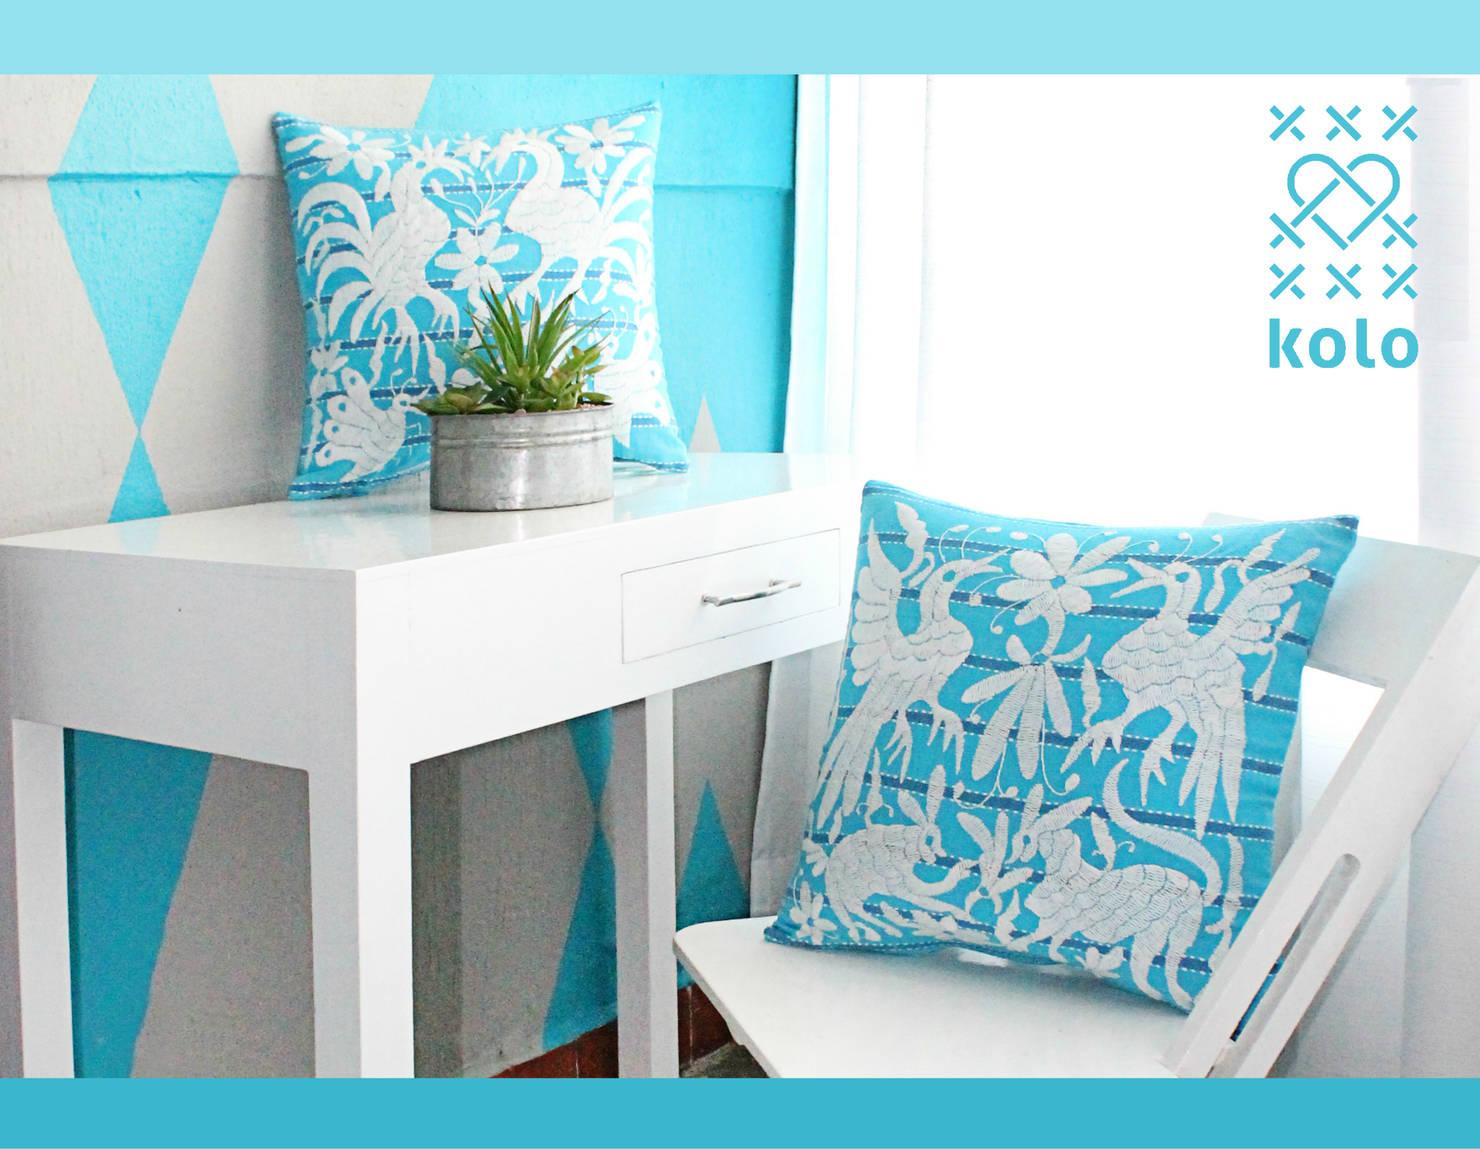 Color azul celeste en decoración